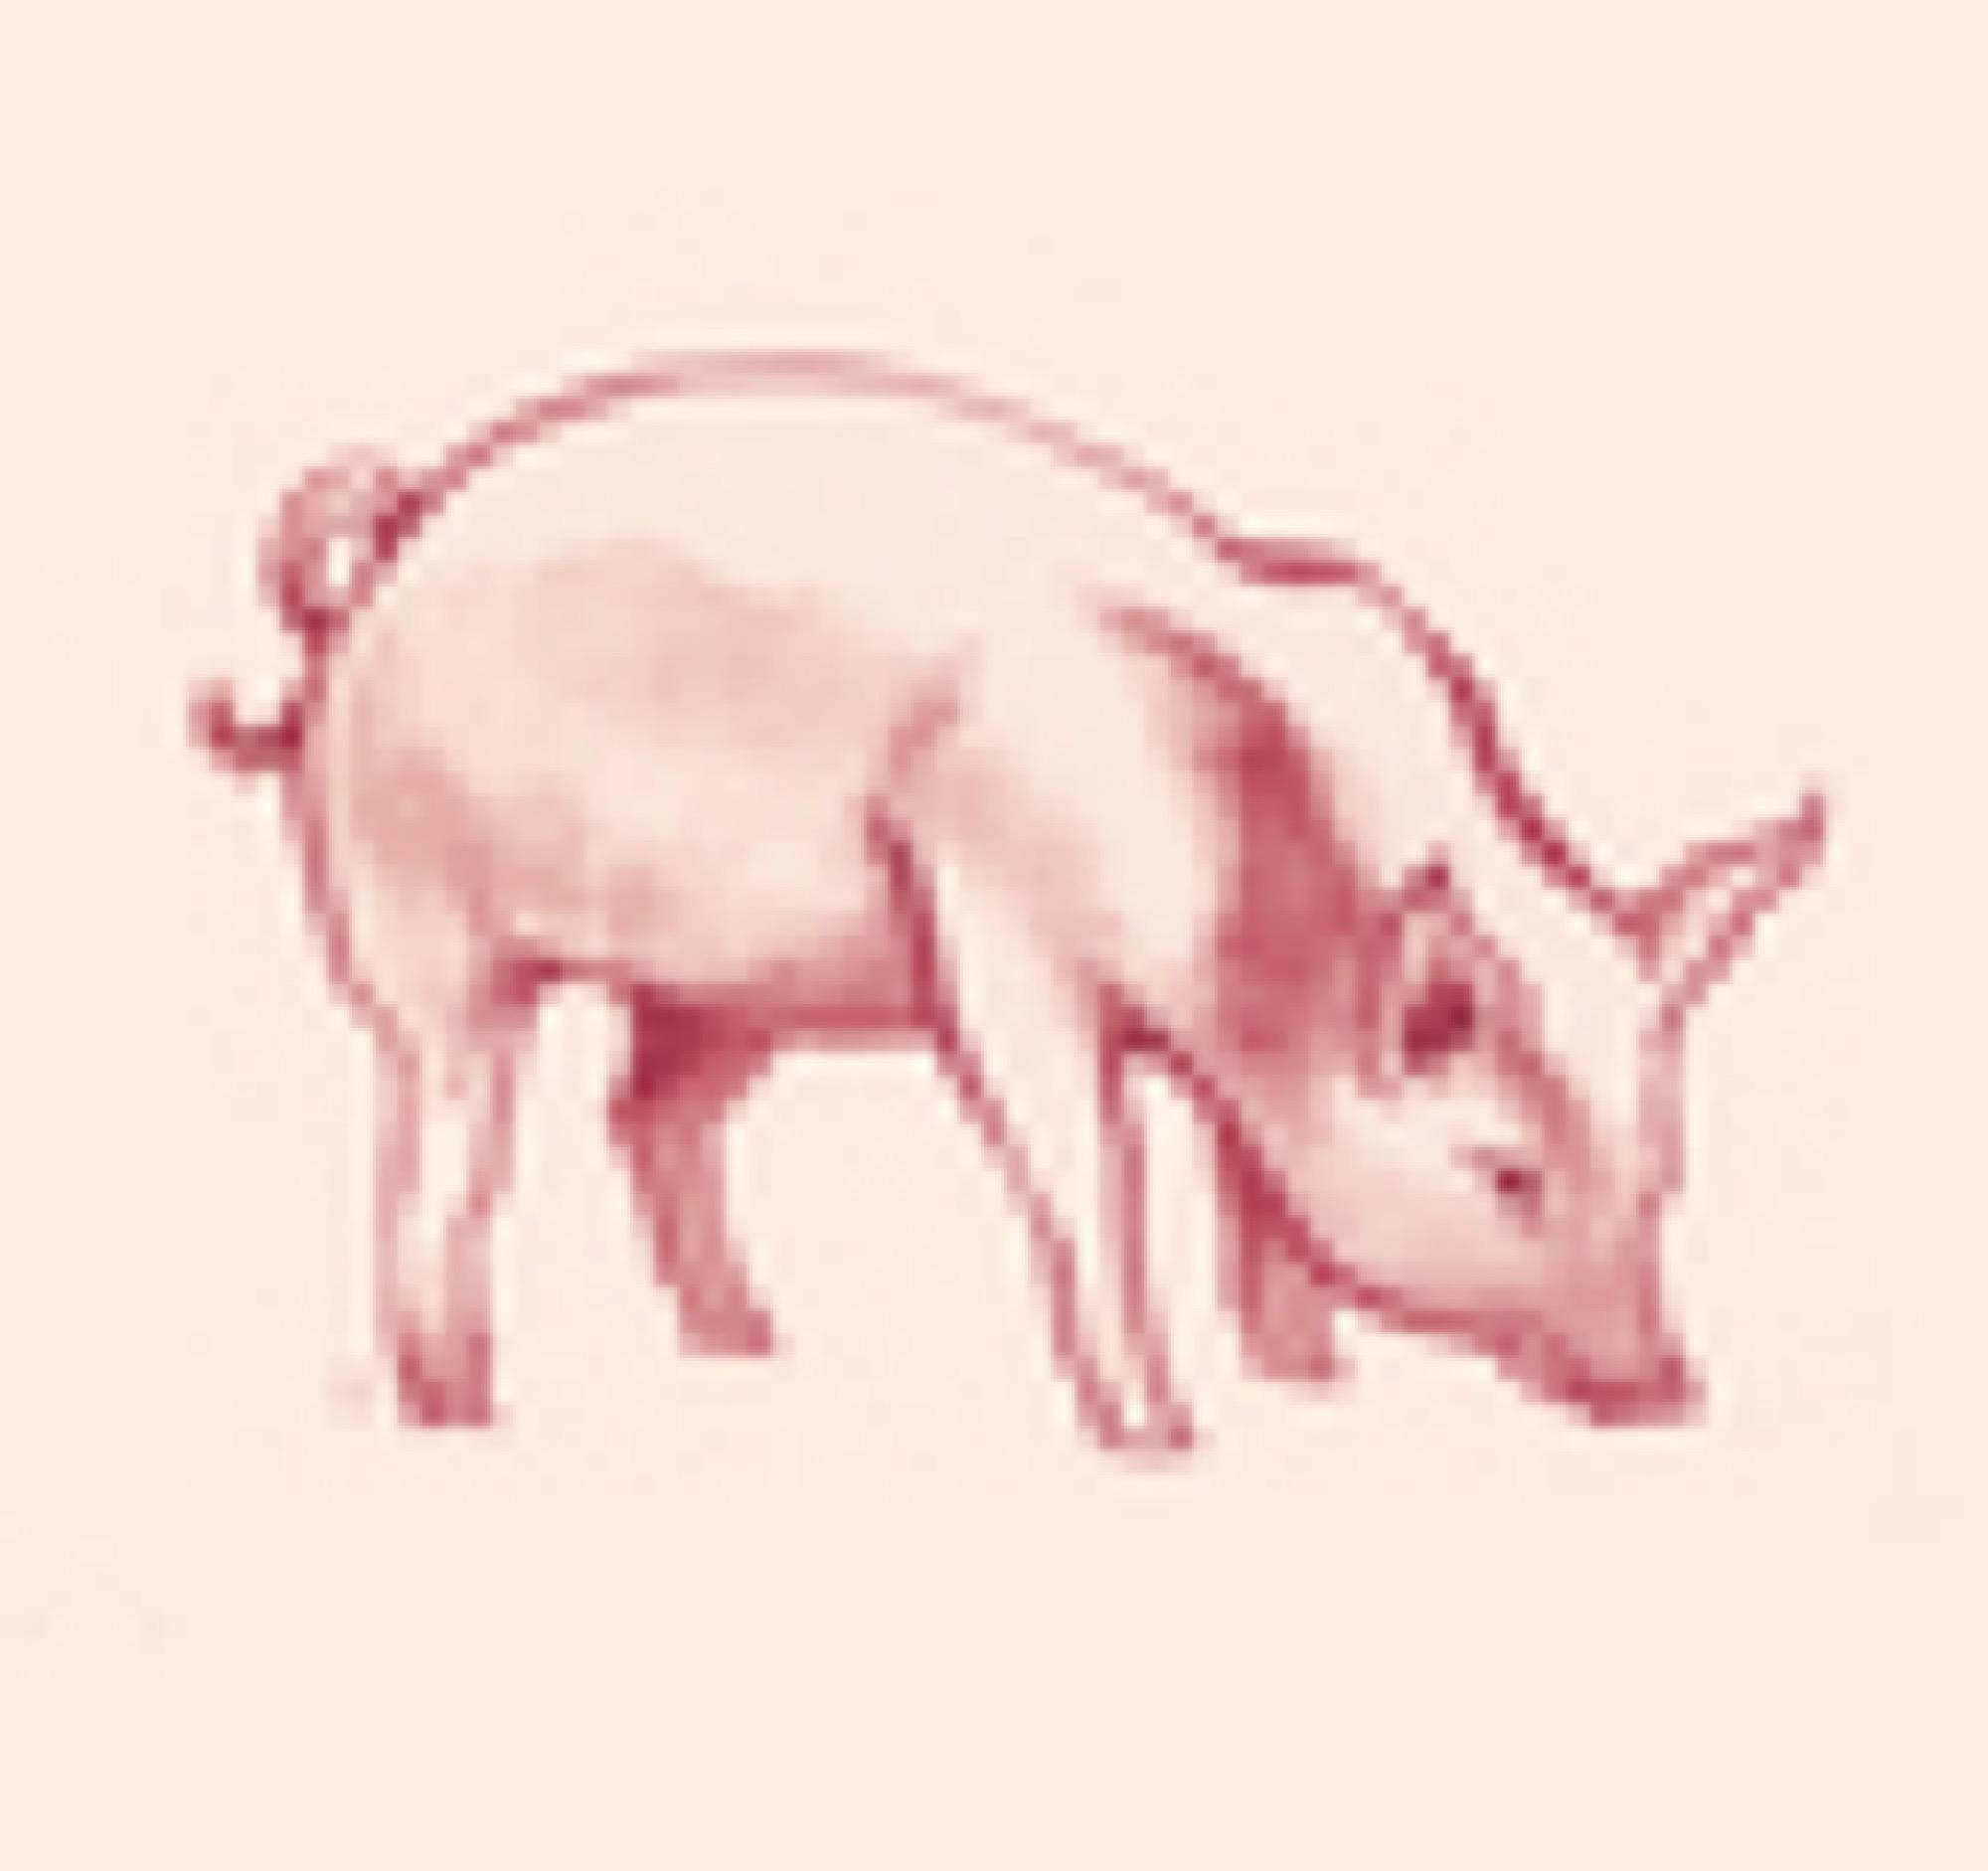 ica korv gris sagamariah 560px